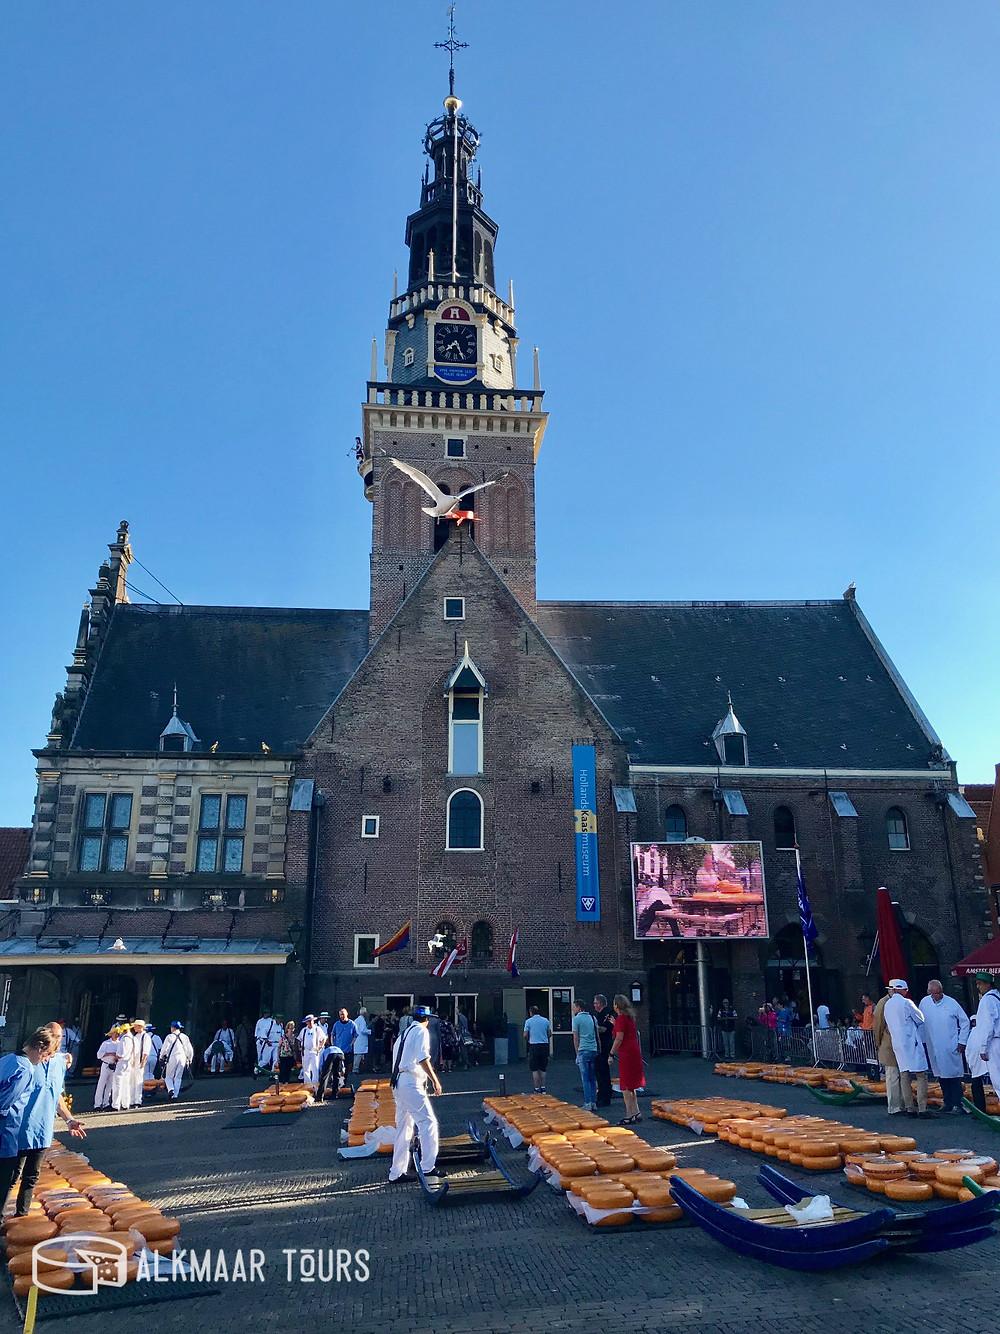 Tuesday Evening Alkmaar Cheese Market